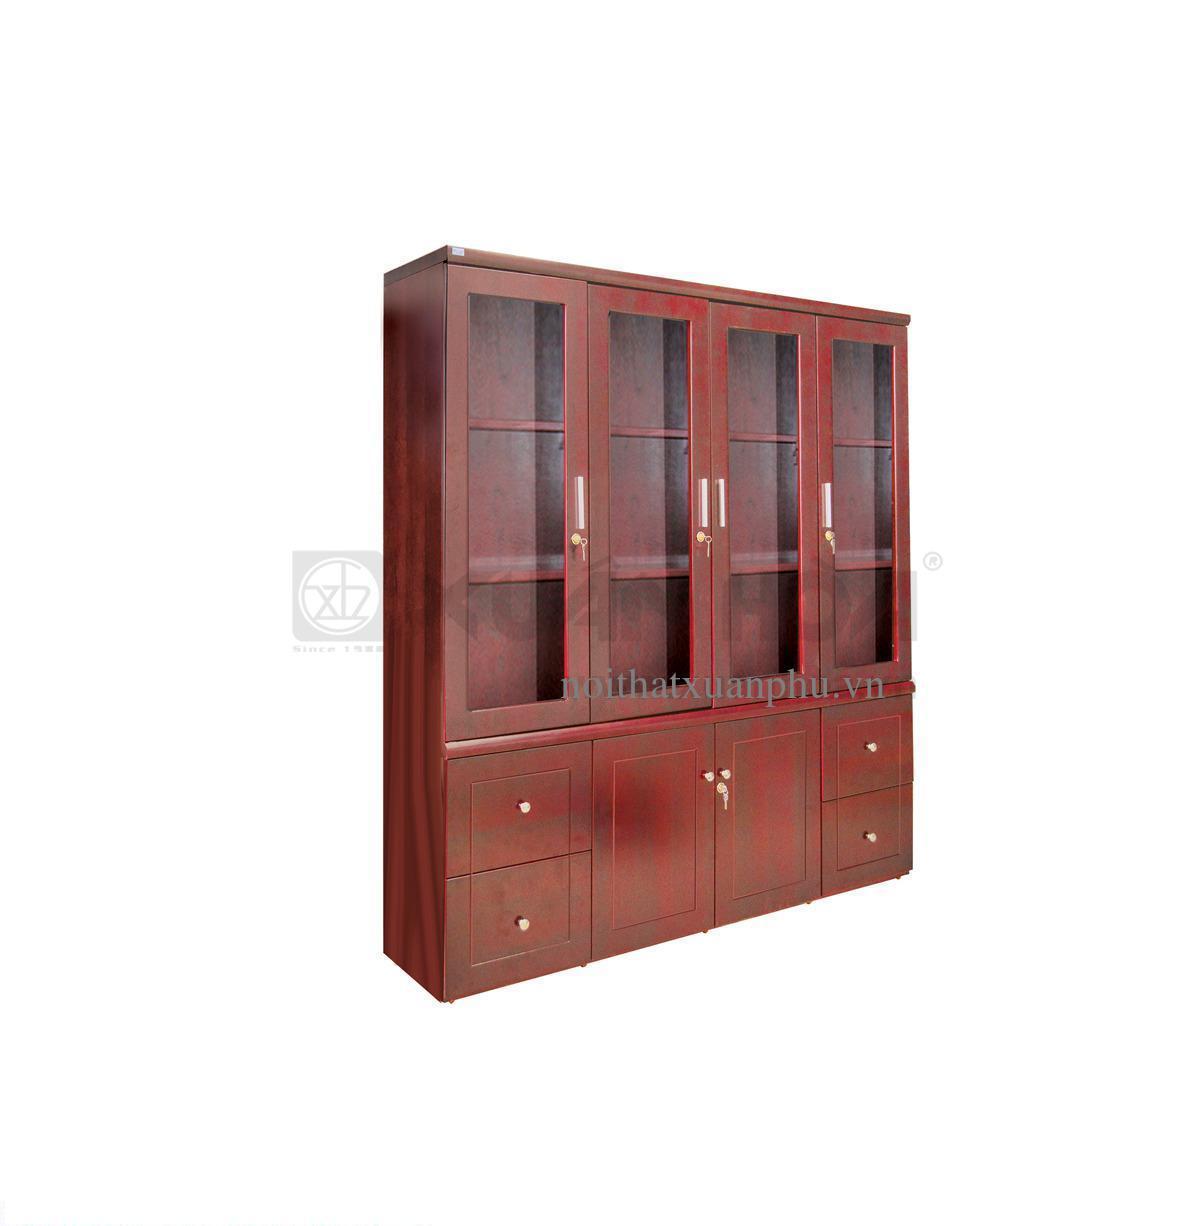 Tủ gỗ sơn TGD-07-00 DD